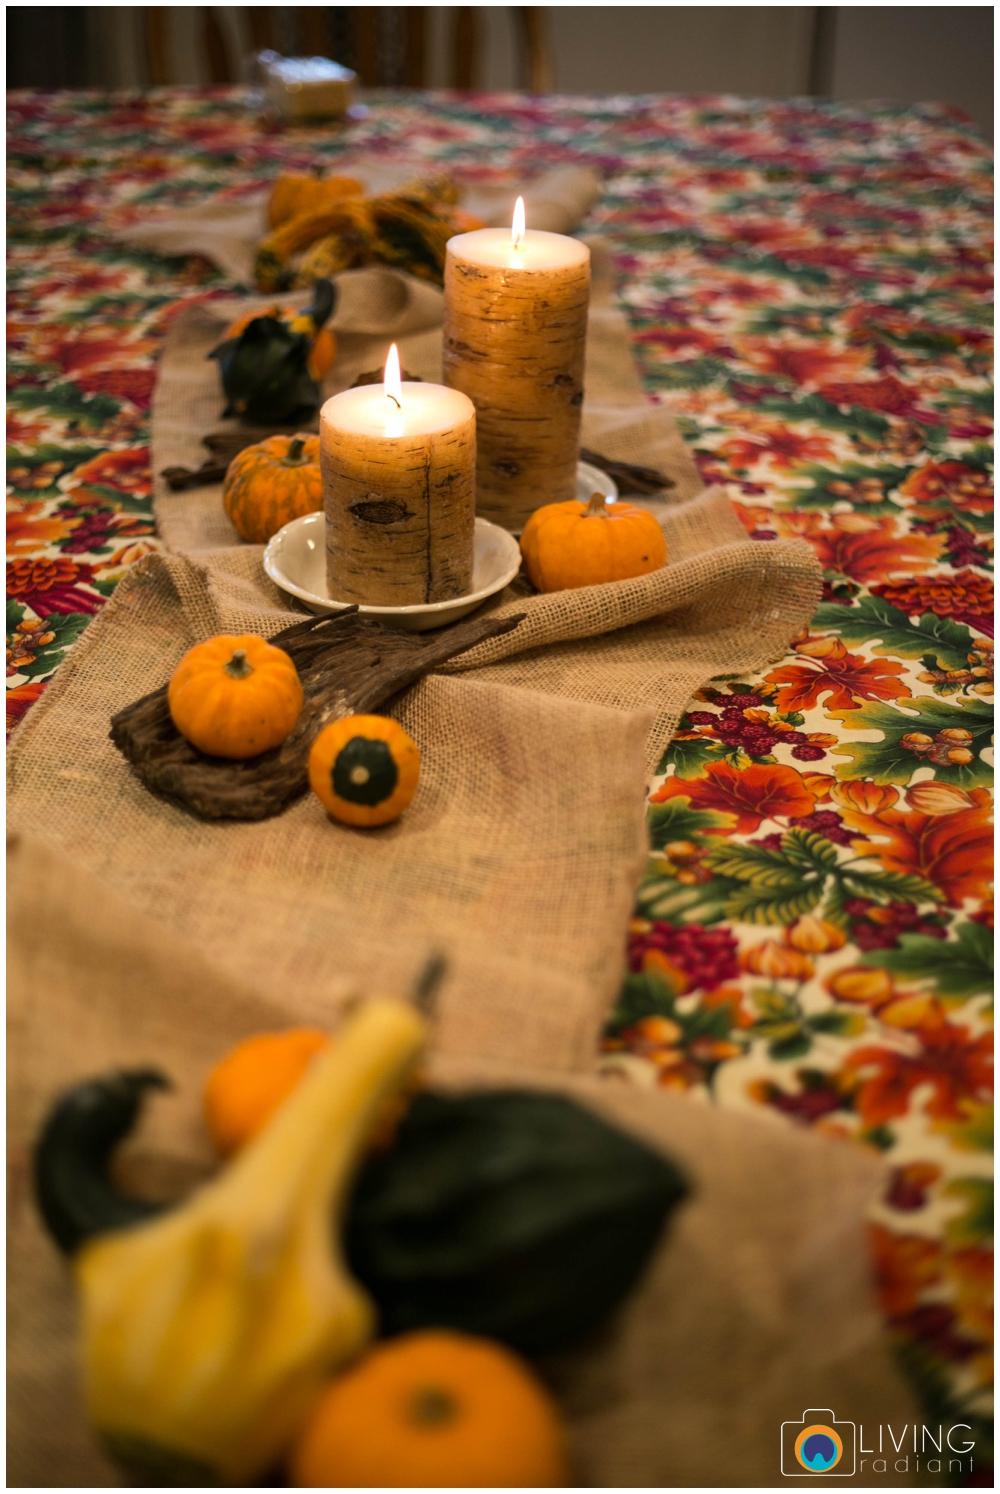 hoffman-nolan-libous-thanksgiving-family-pumpkins-and-pinecones_0001.jpg